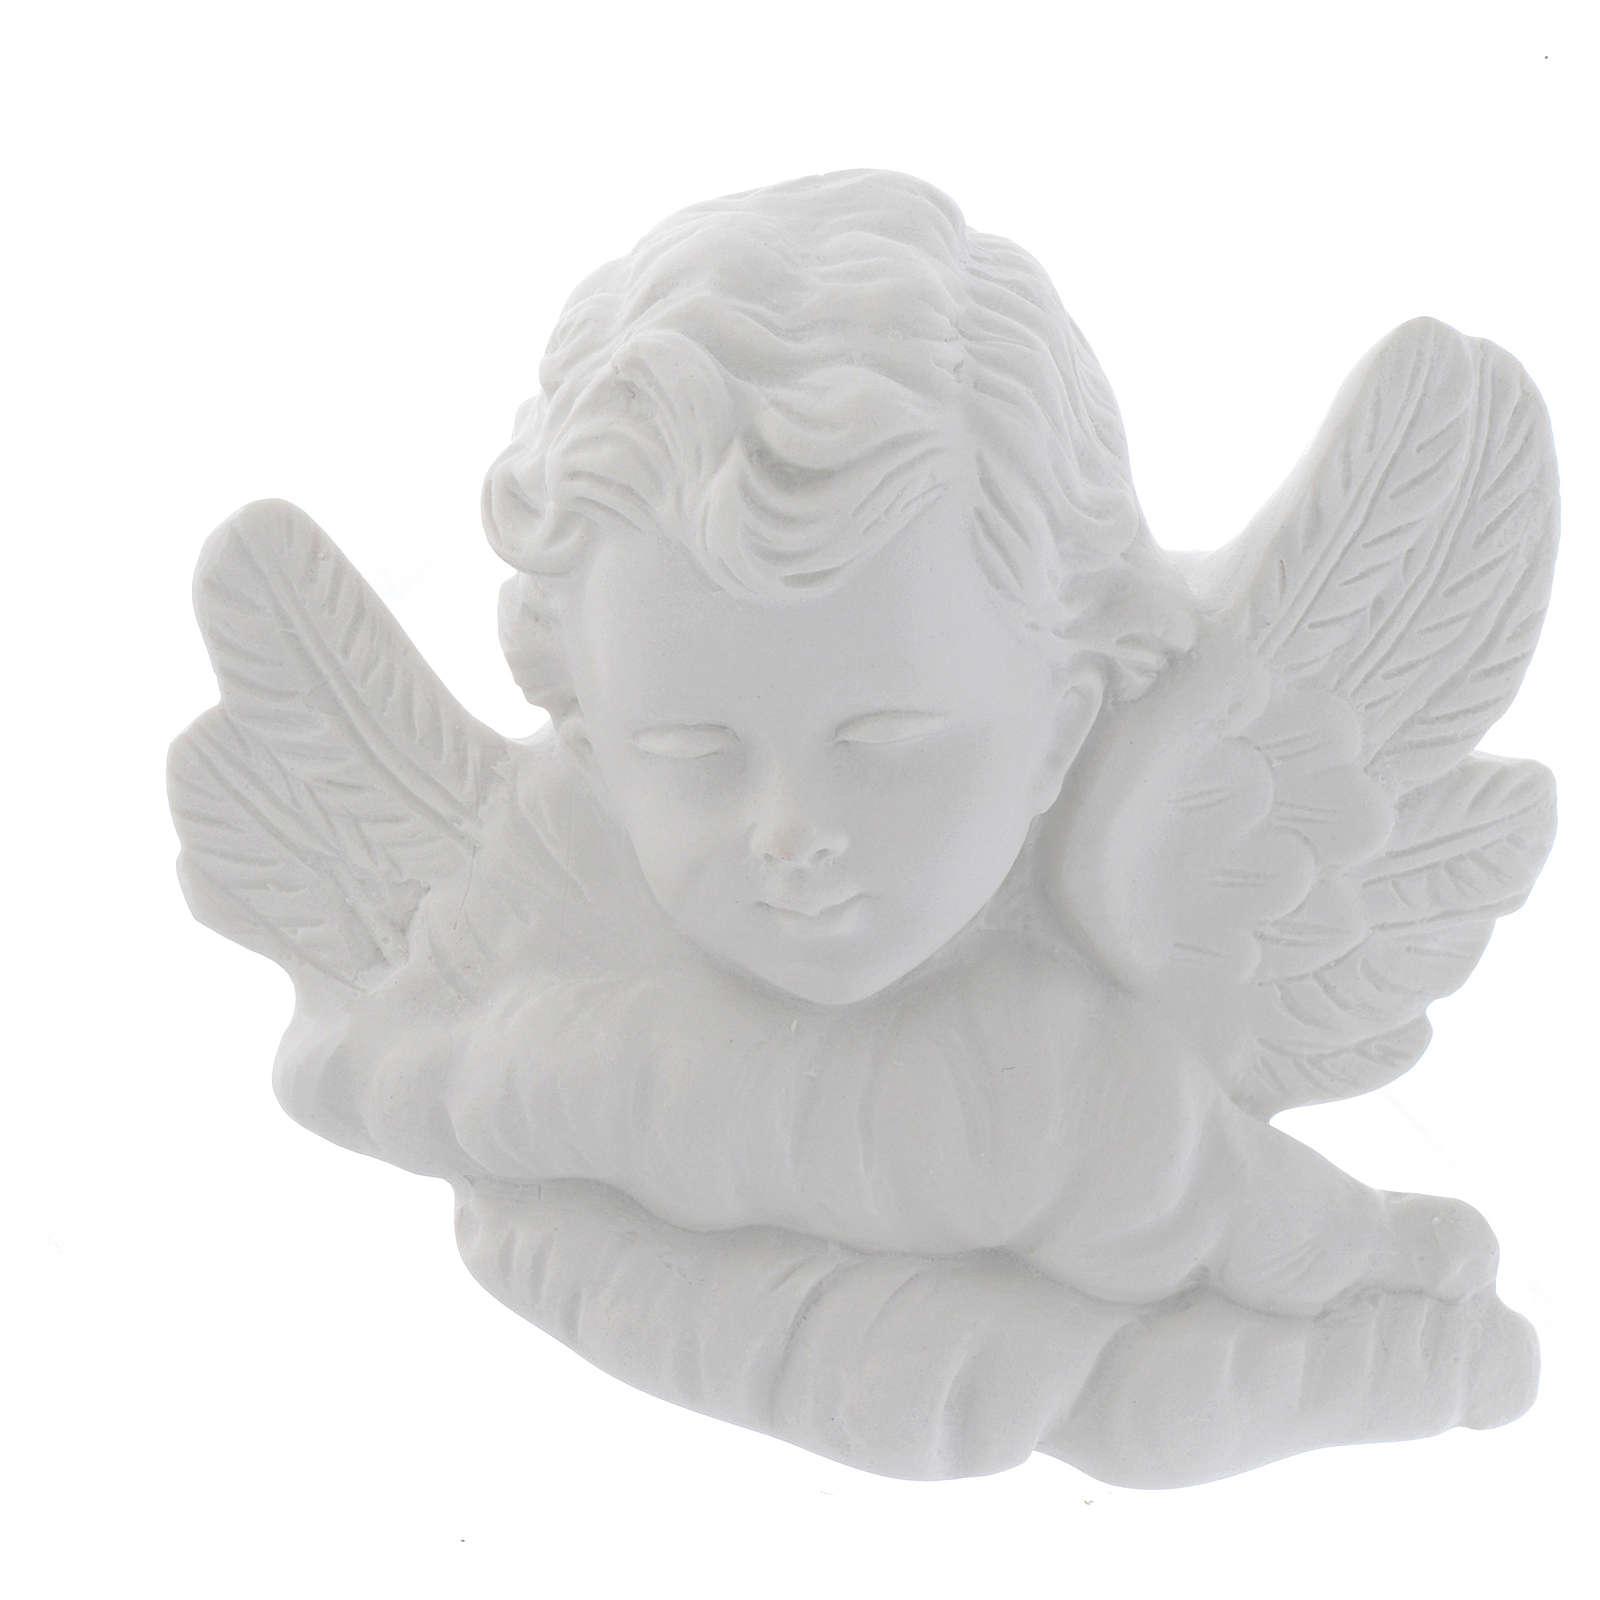 Testina angioletto 11 cm marmo rilievo 3